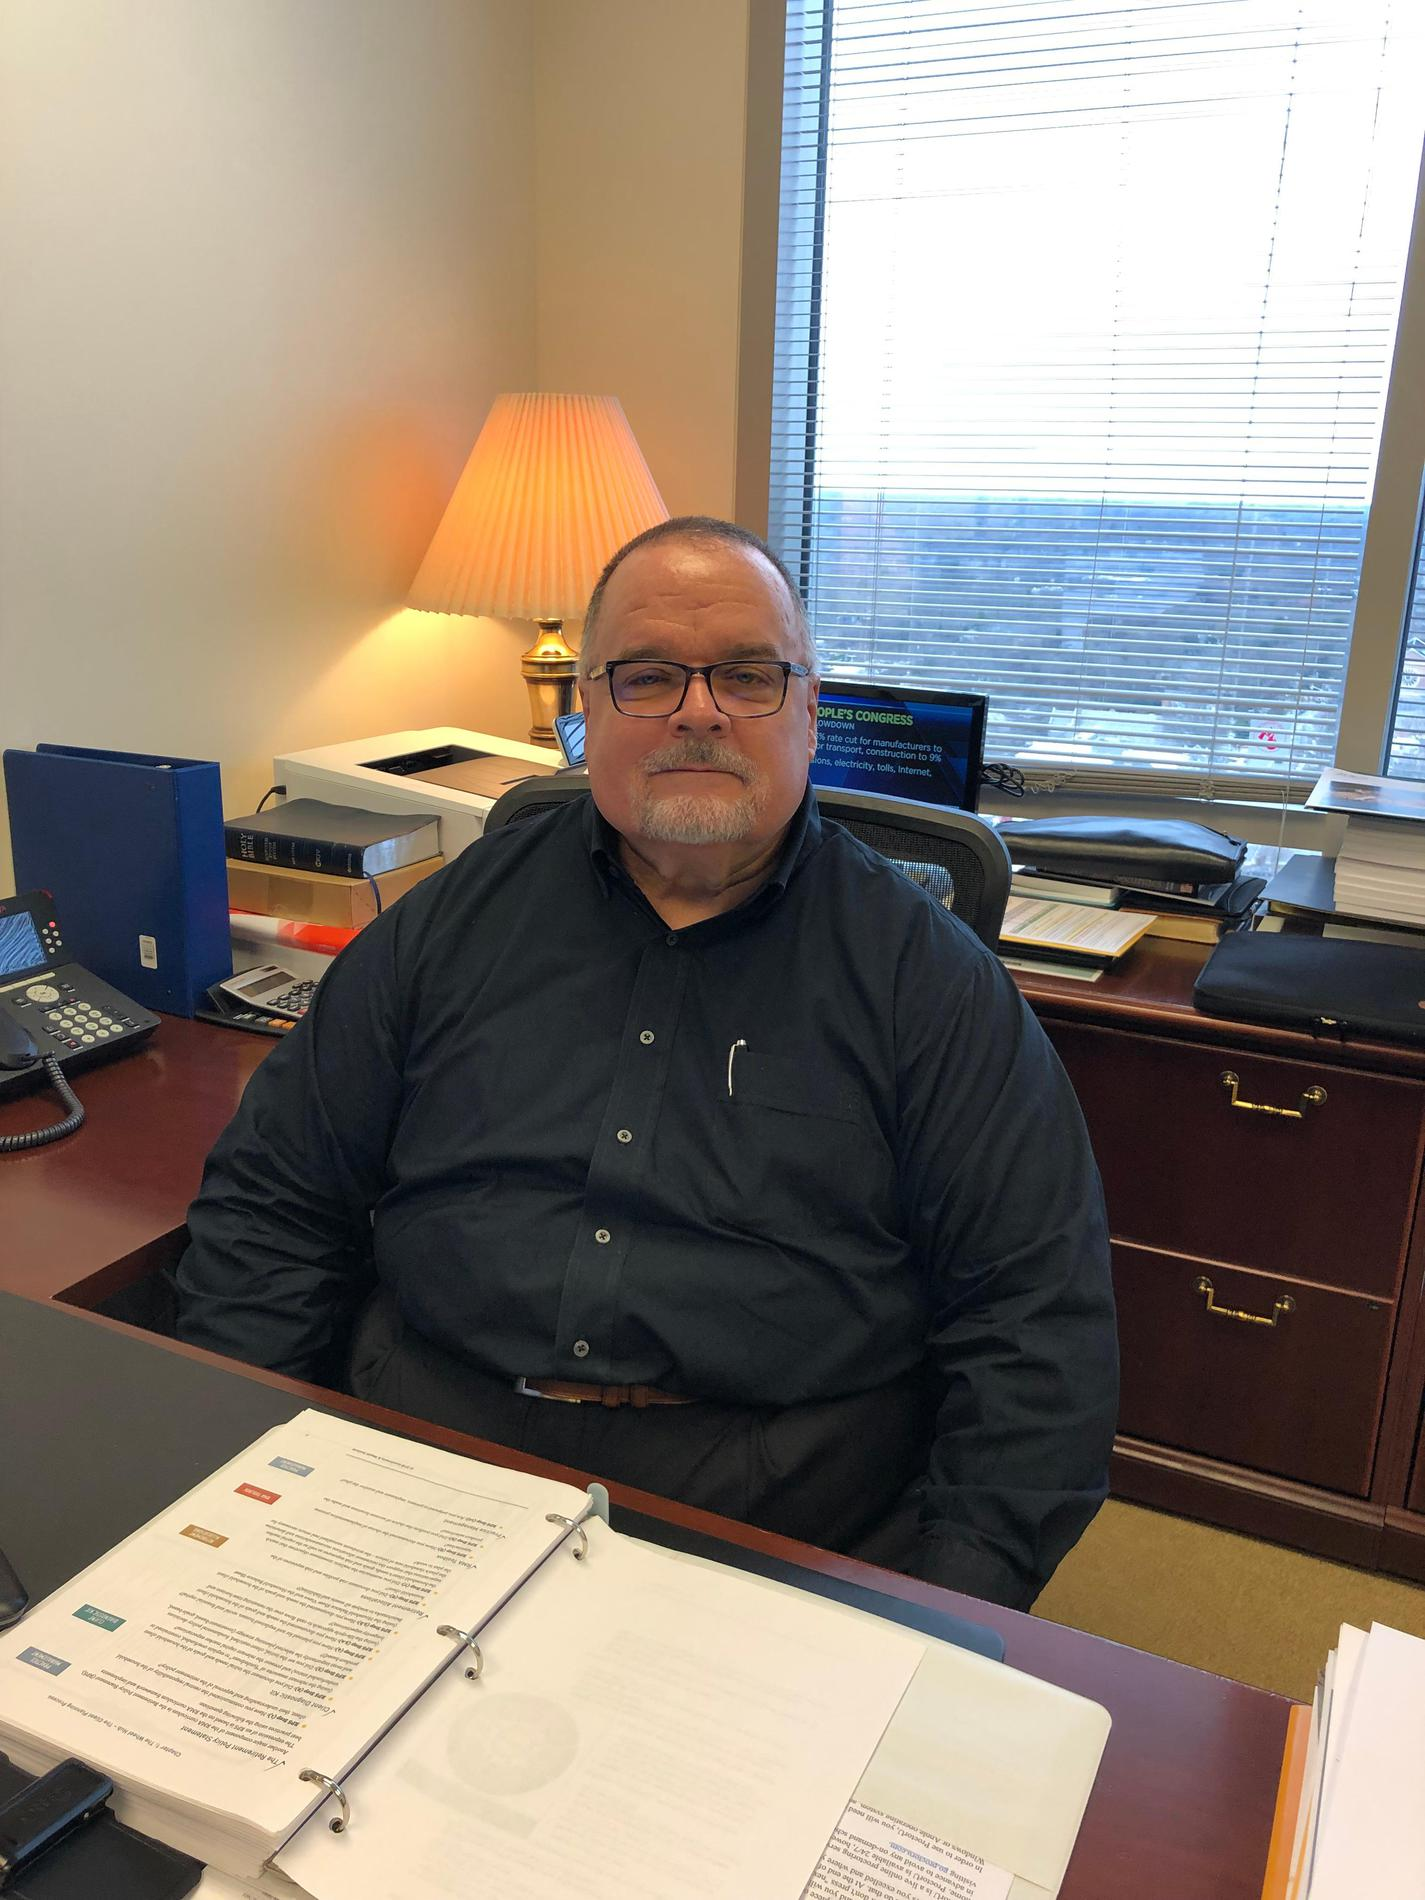 Michael A Robertson | Greensboro, NC | Morgan Stanley Wealth